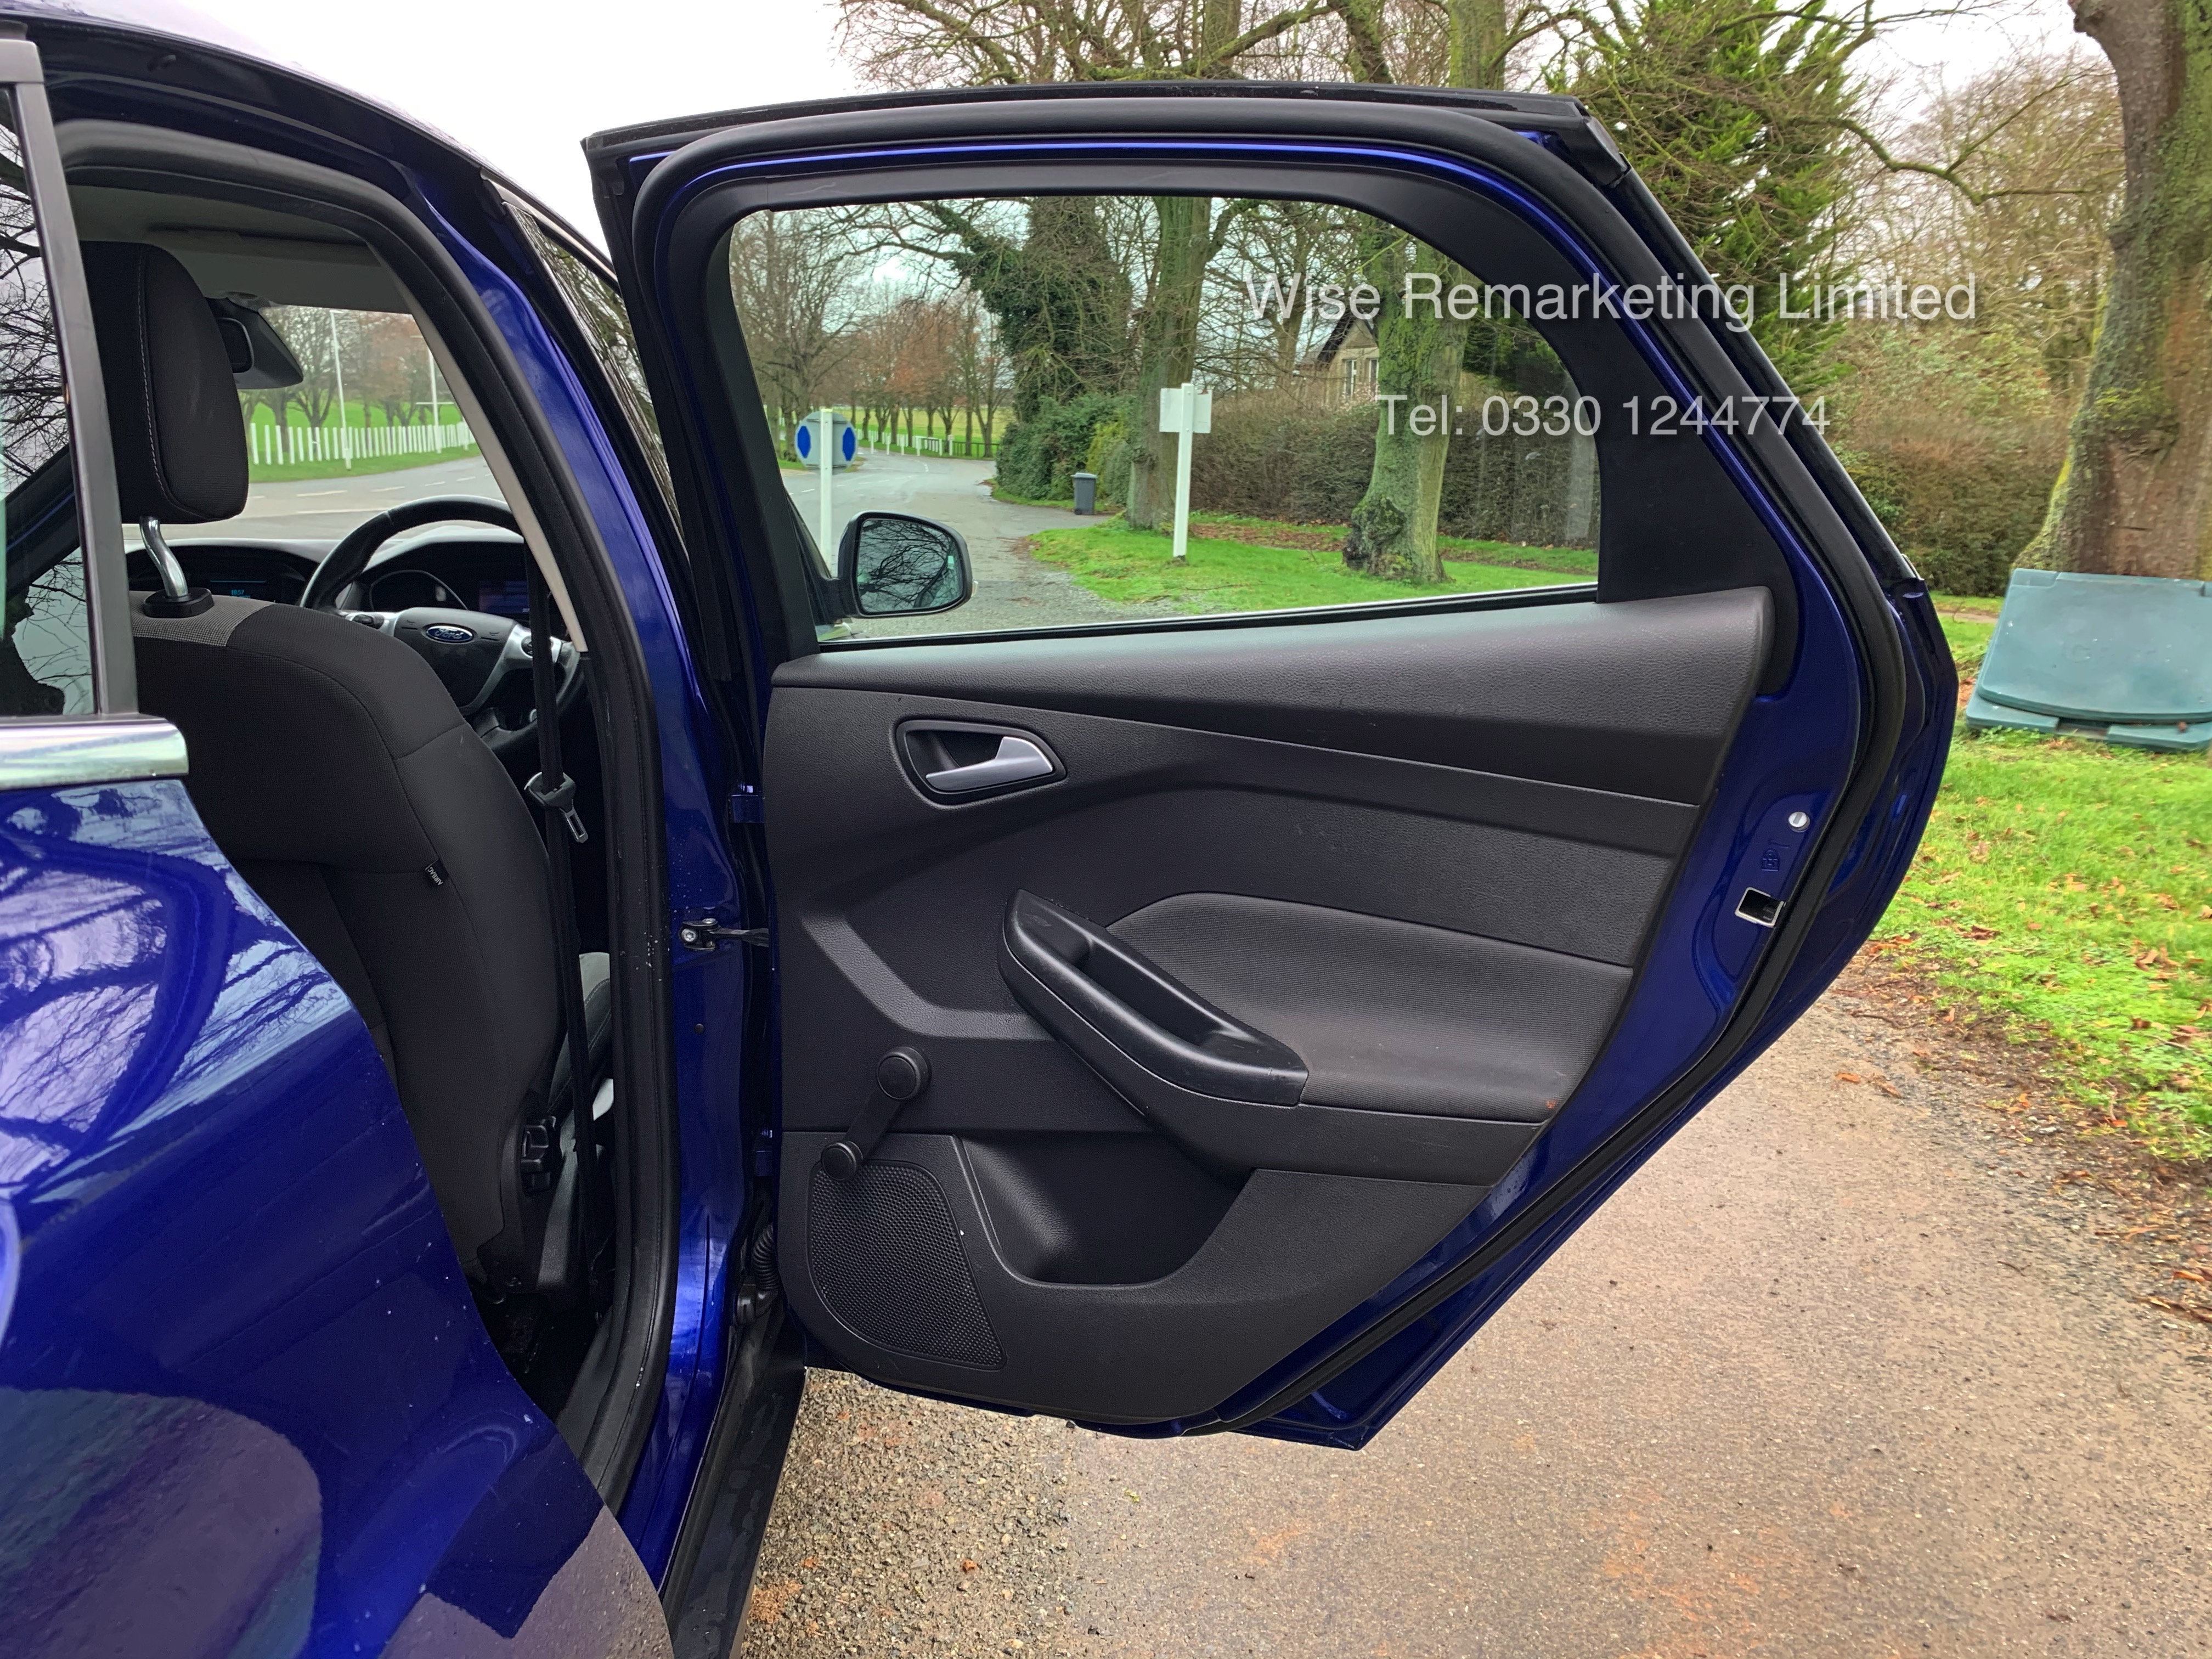 Ford Focus Zetec 1.6 TDCI Econetic - 2015 Model - 6 Speed - - Image 11 of 20